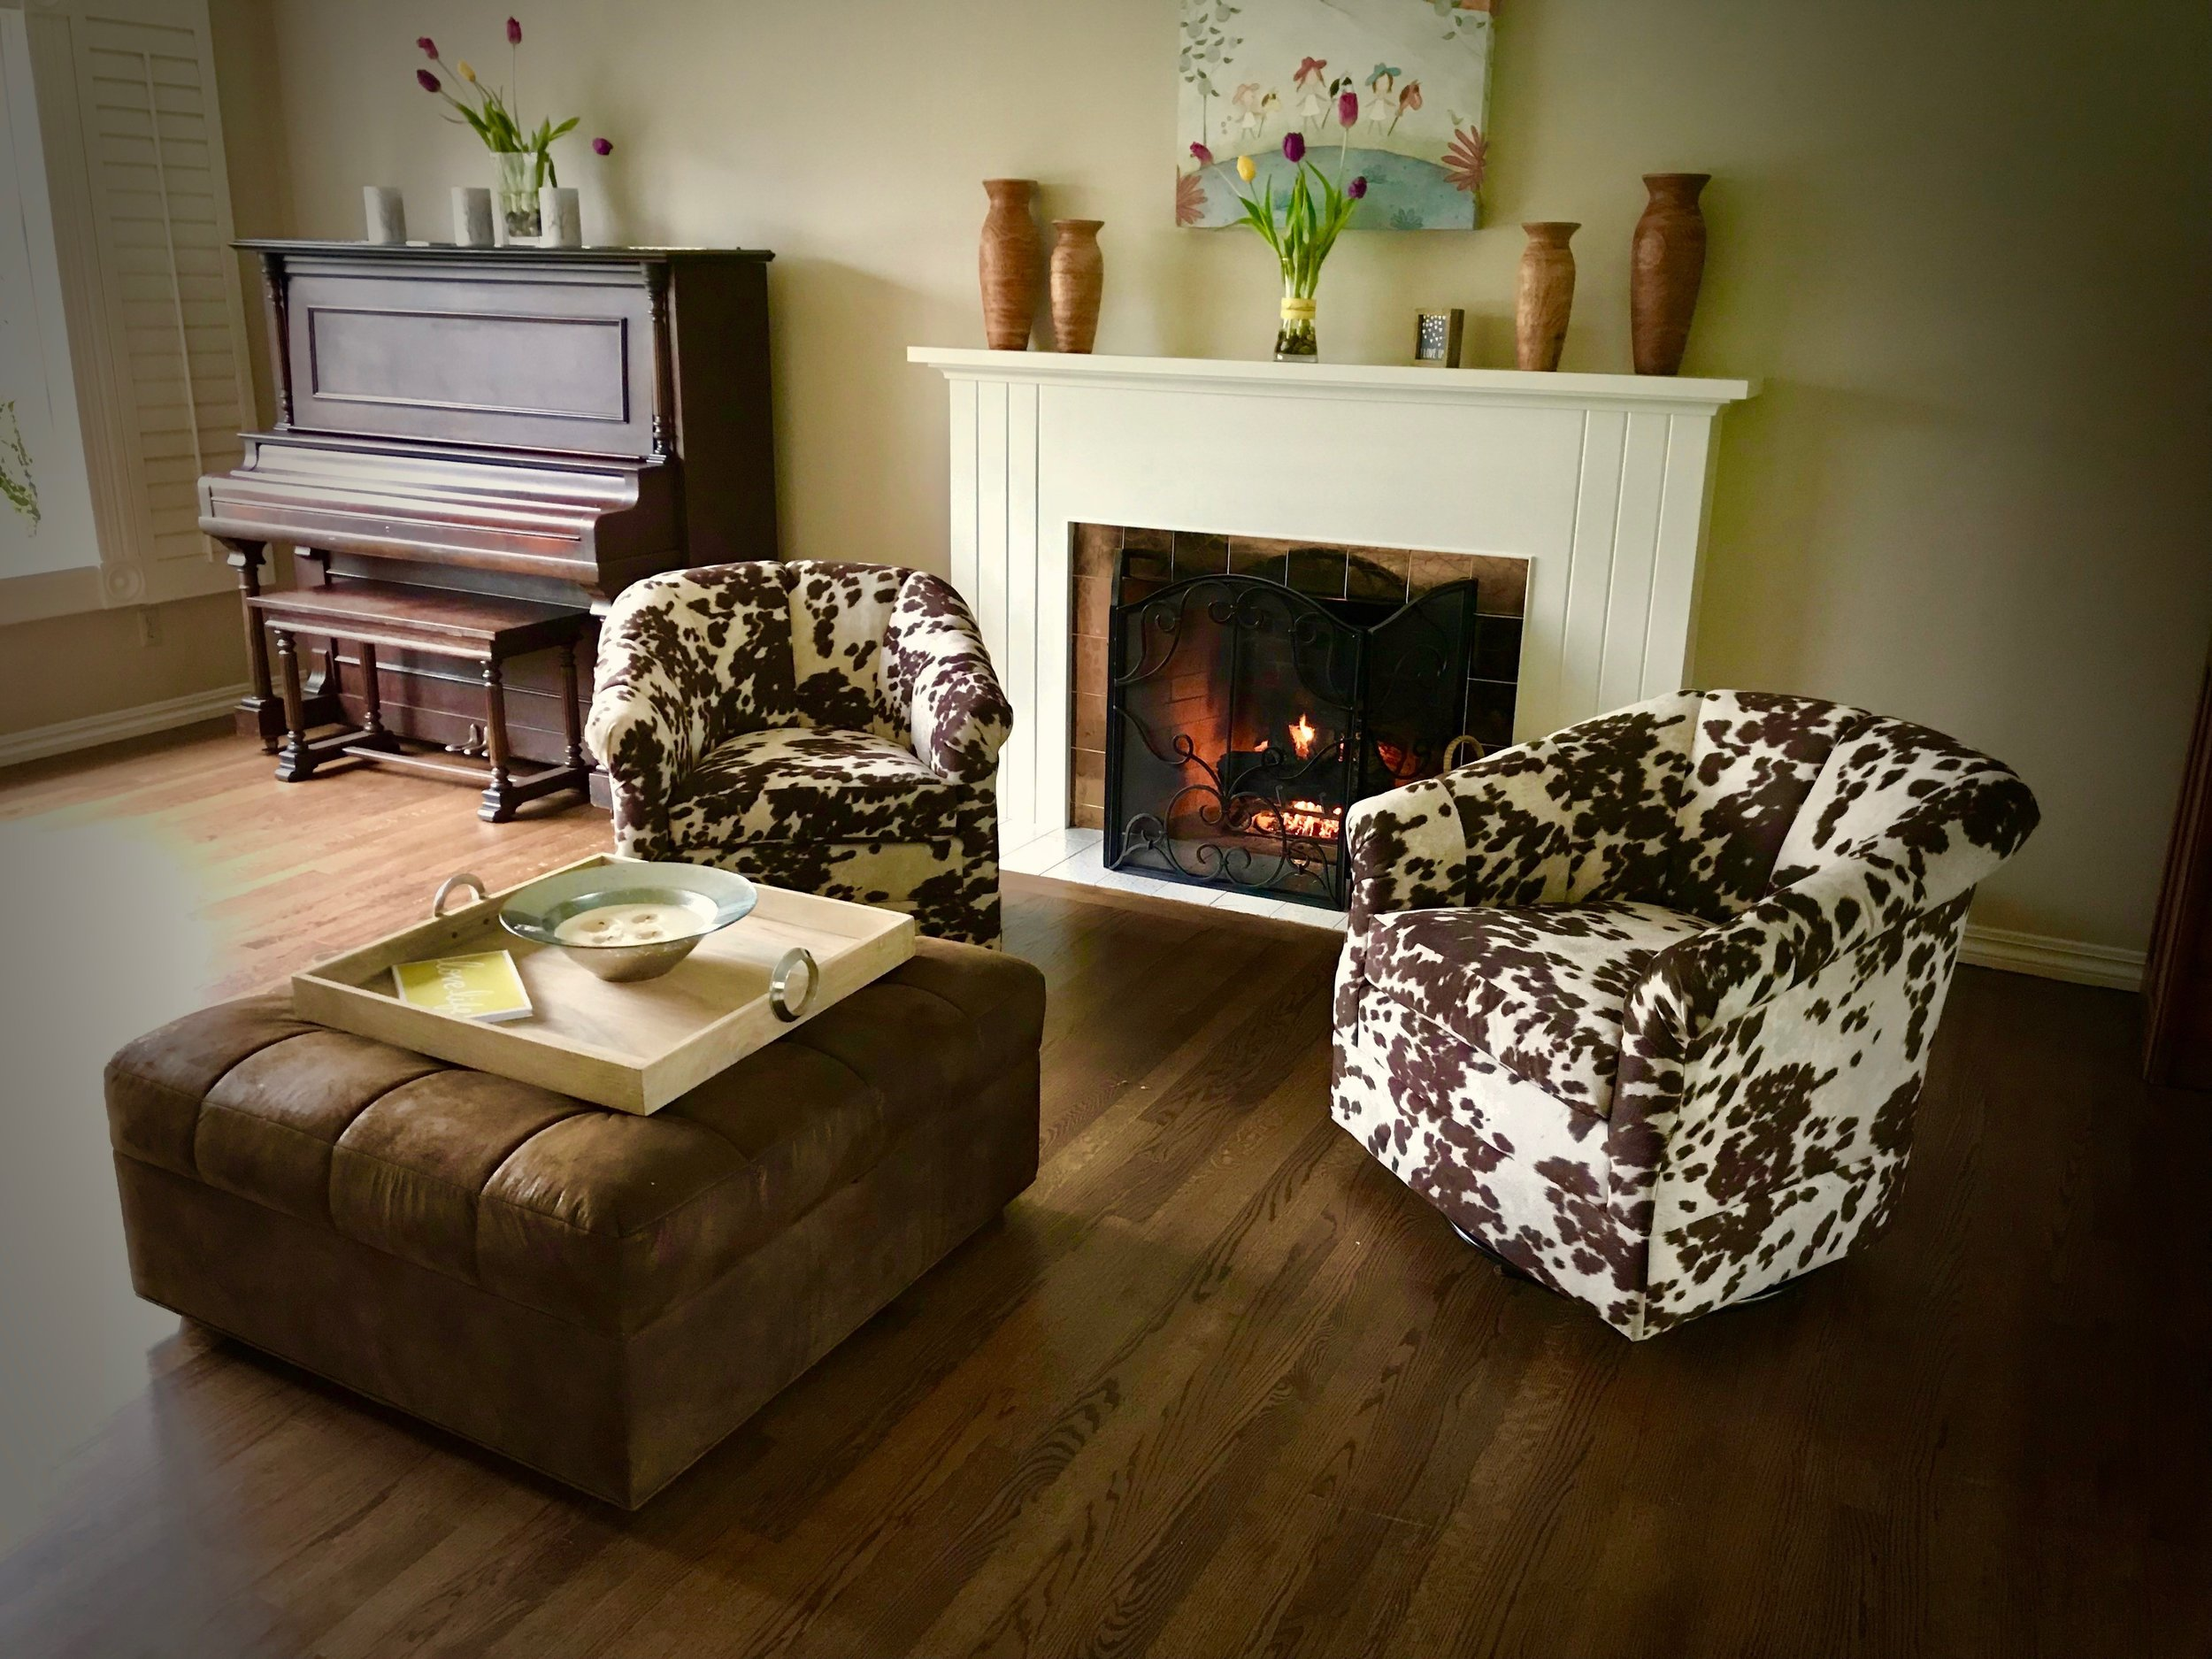 Sophie Swivel Glider Chairs